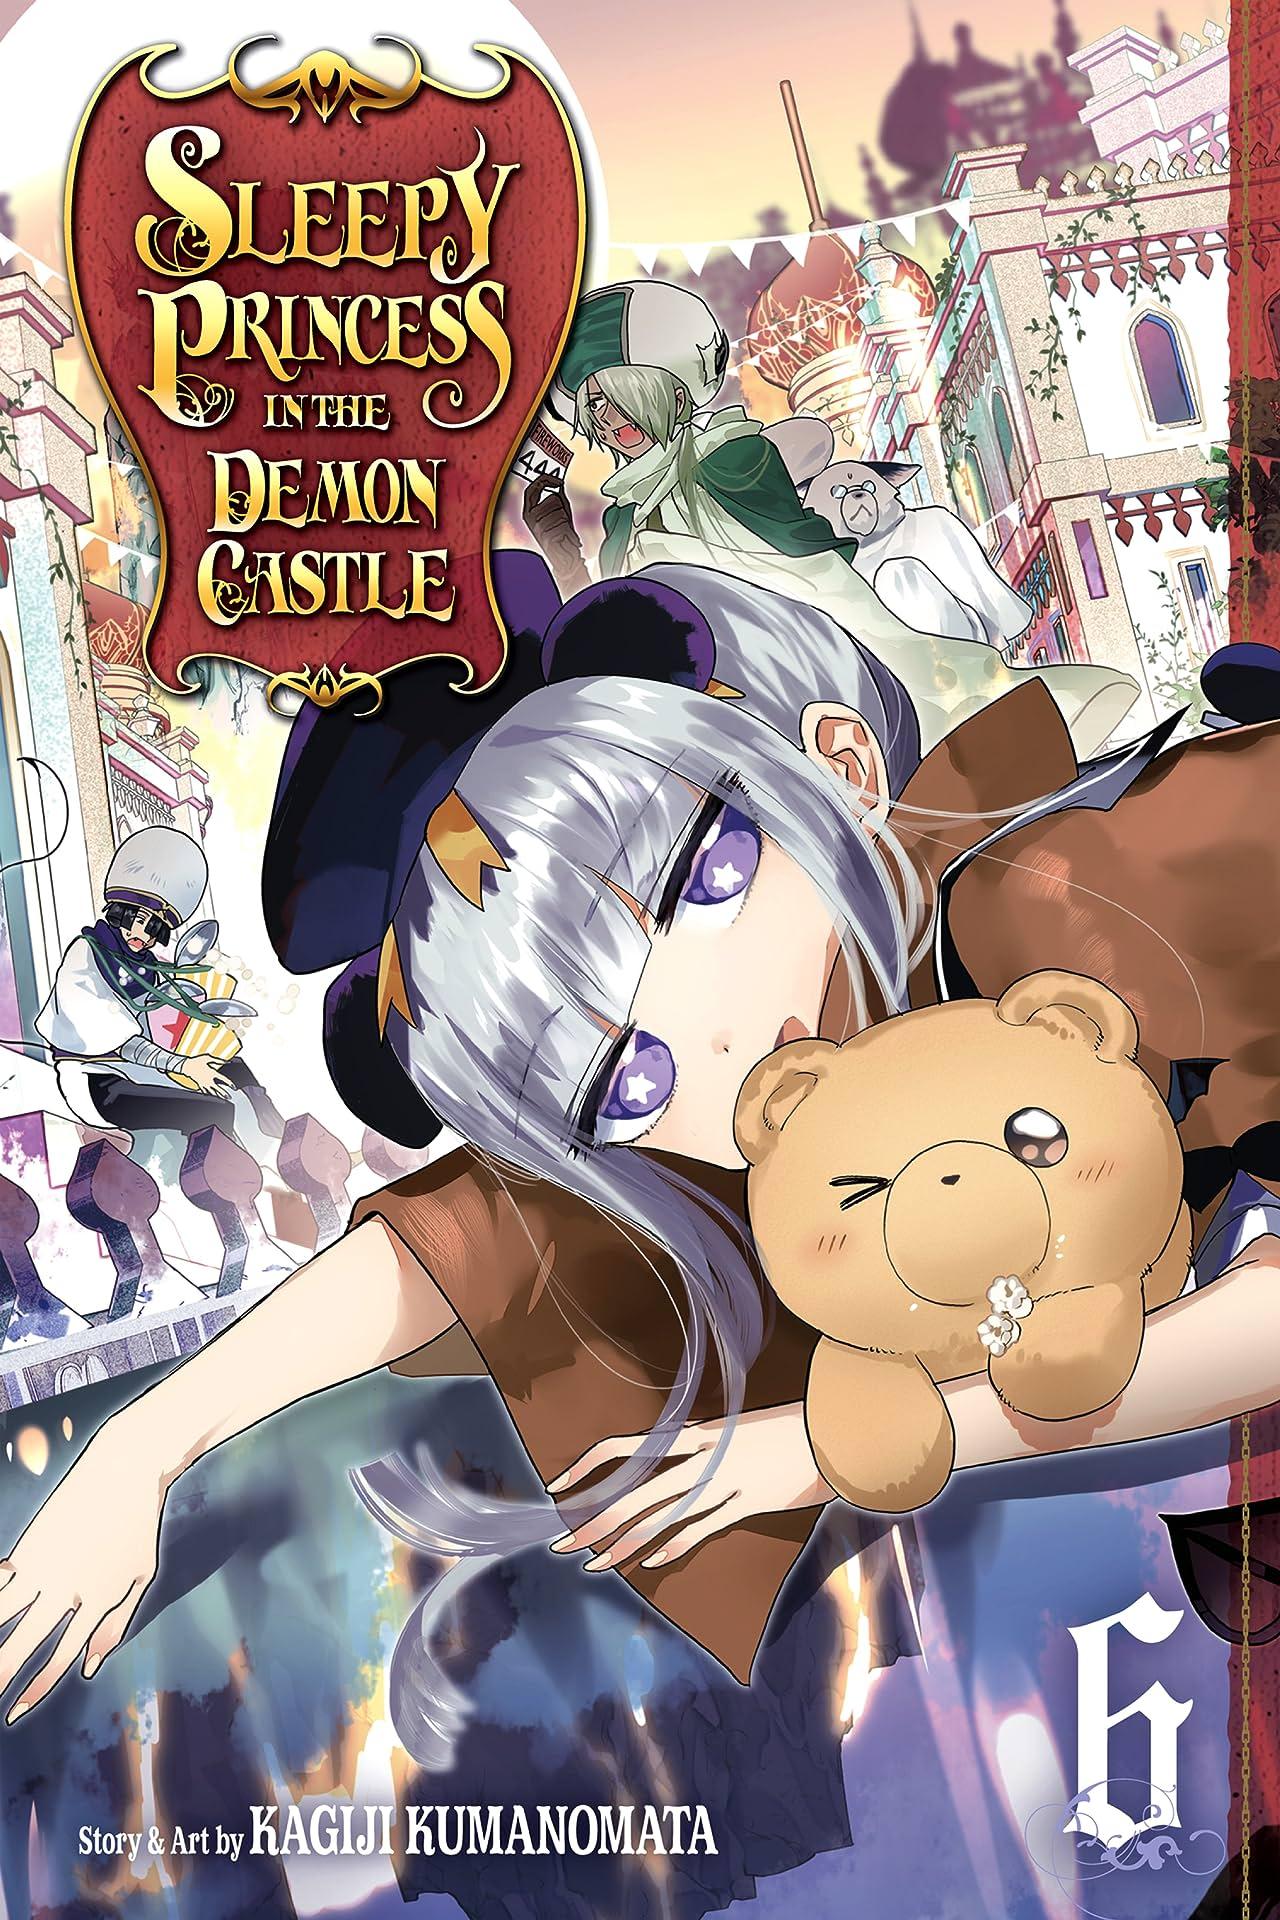 Sleepy Princess in the Demon Castle Vol. 6